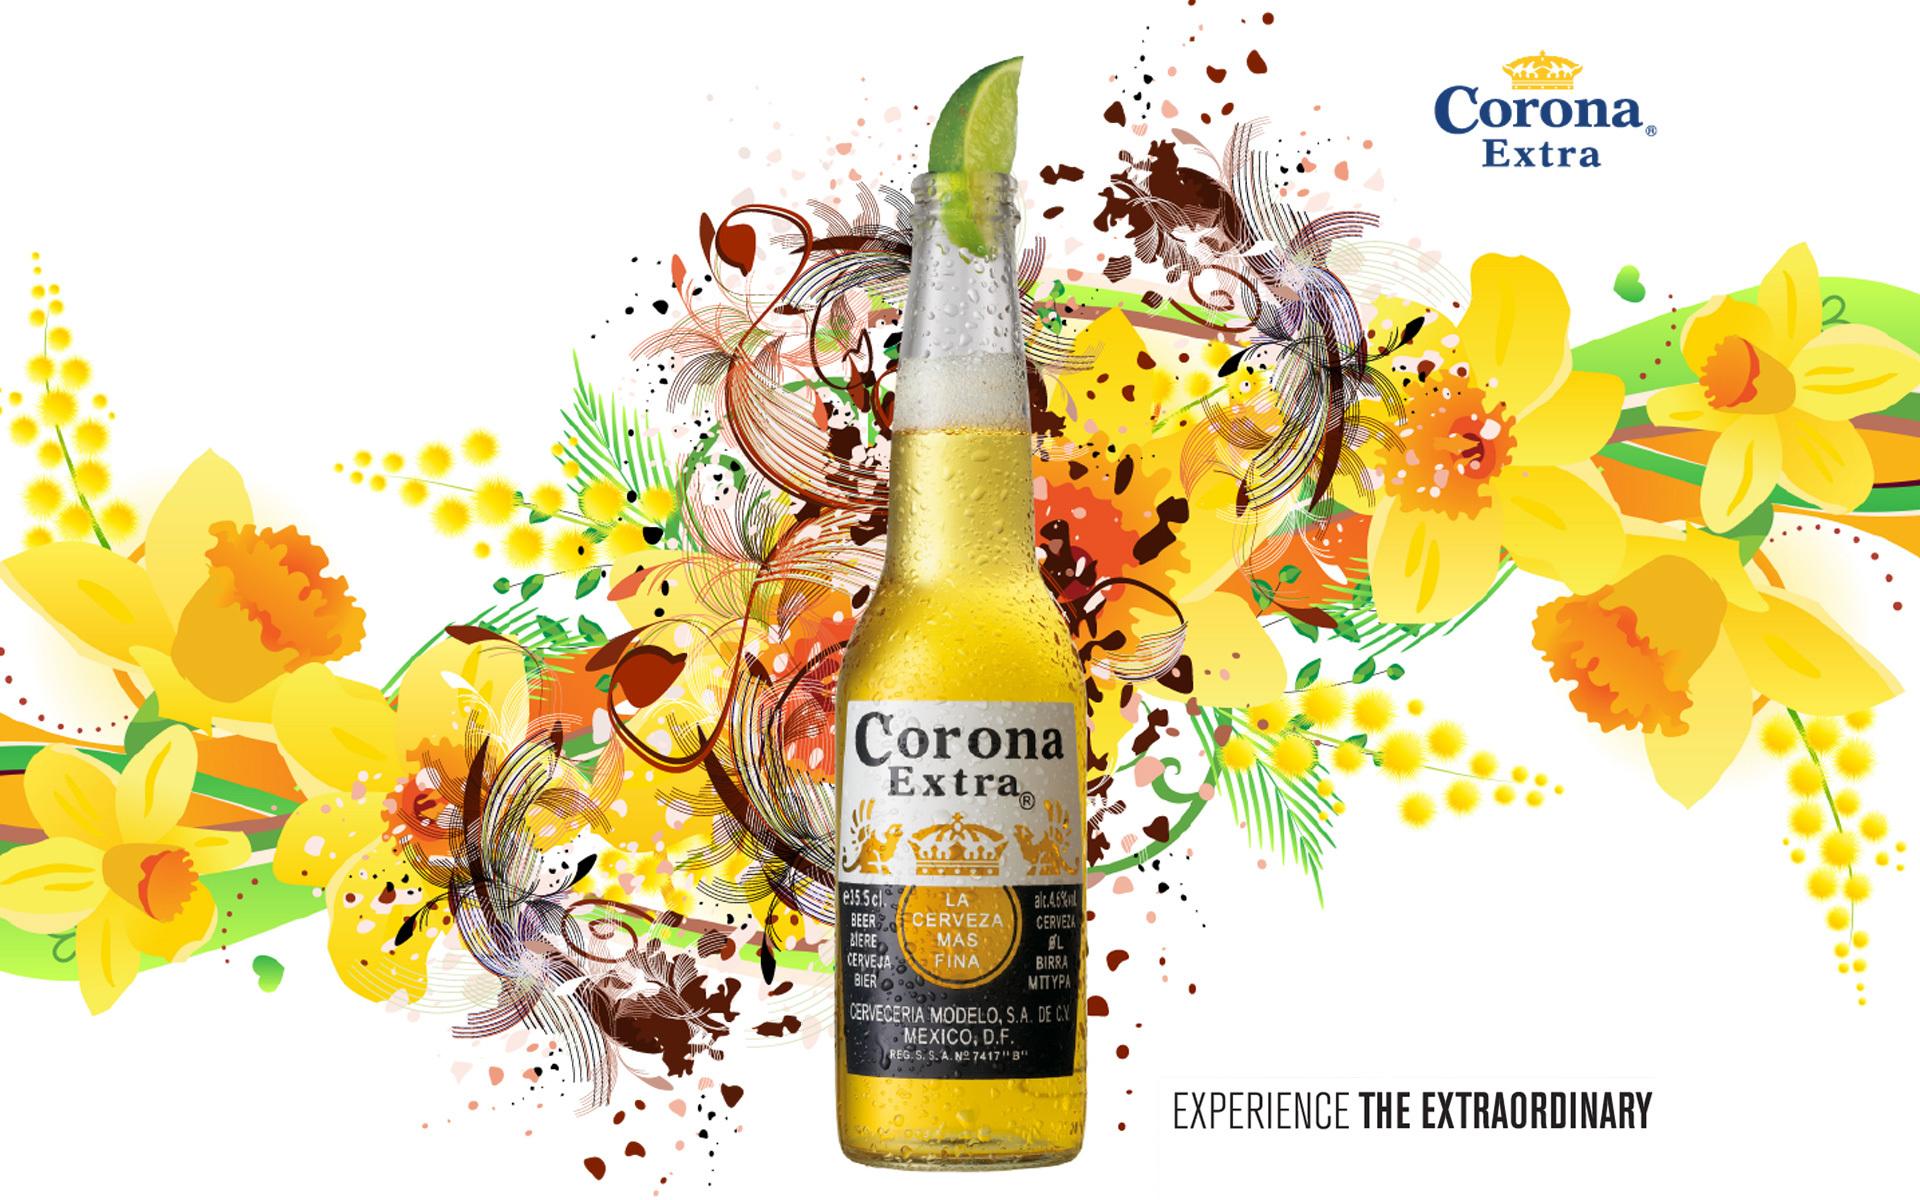 Corona Extra Hd Wallpaper